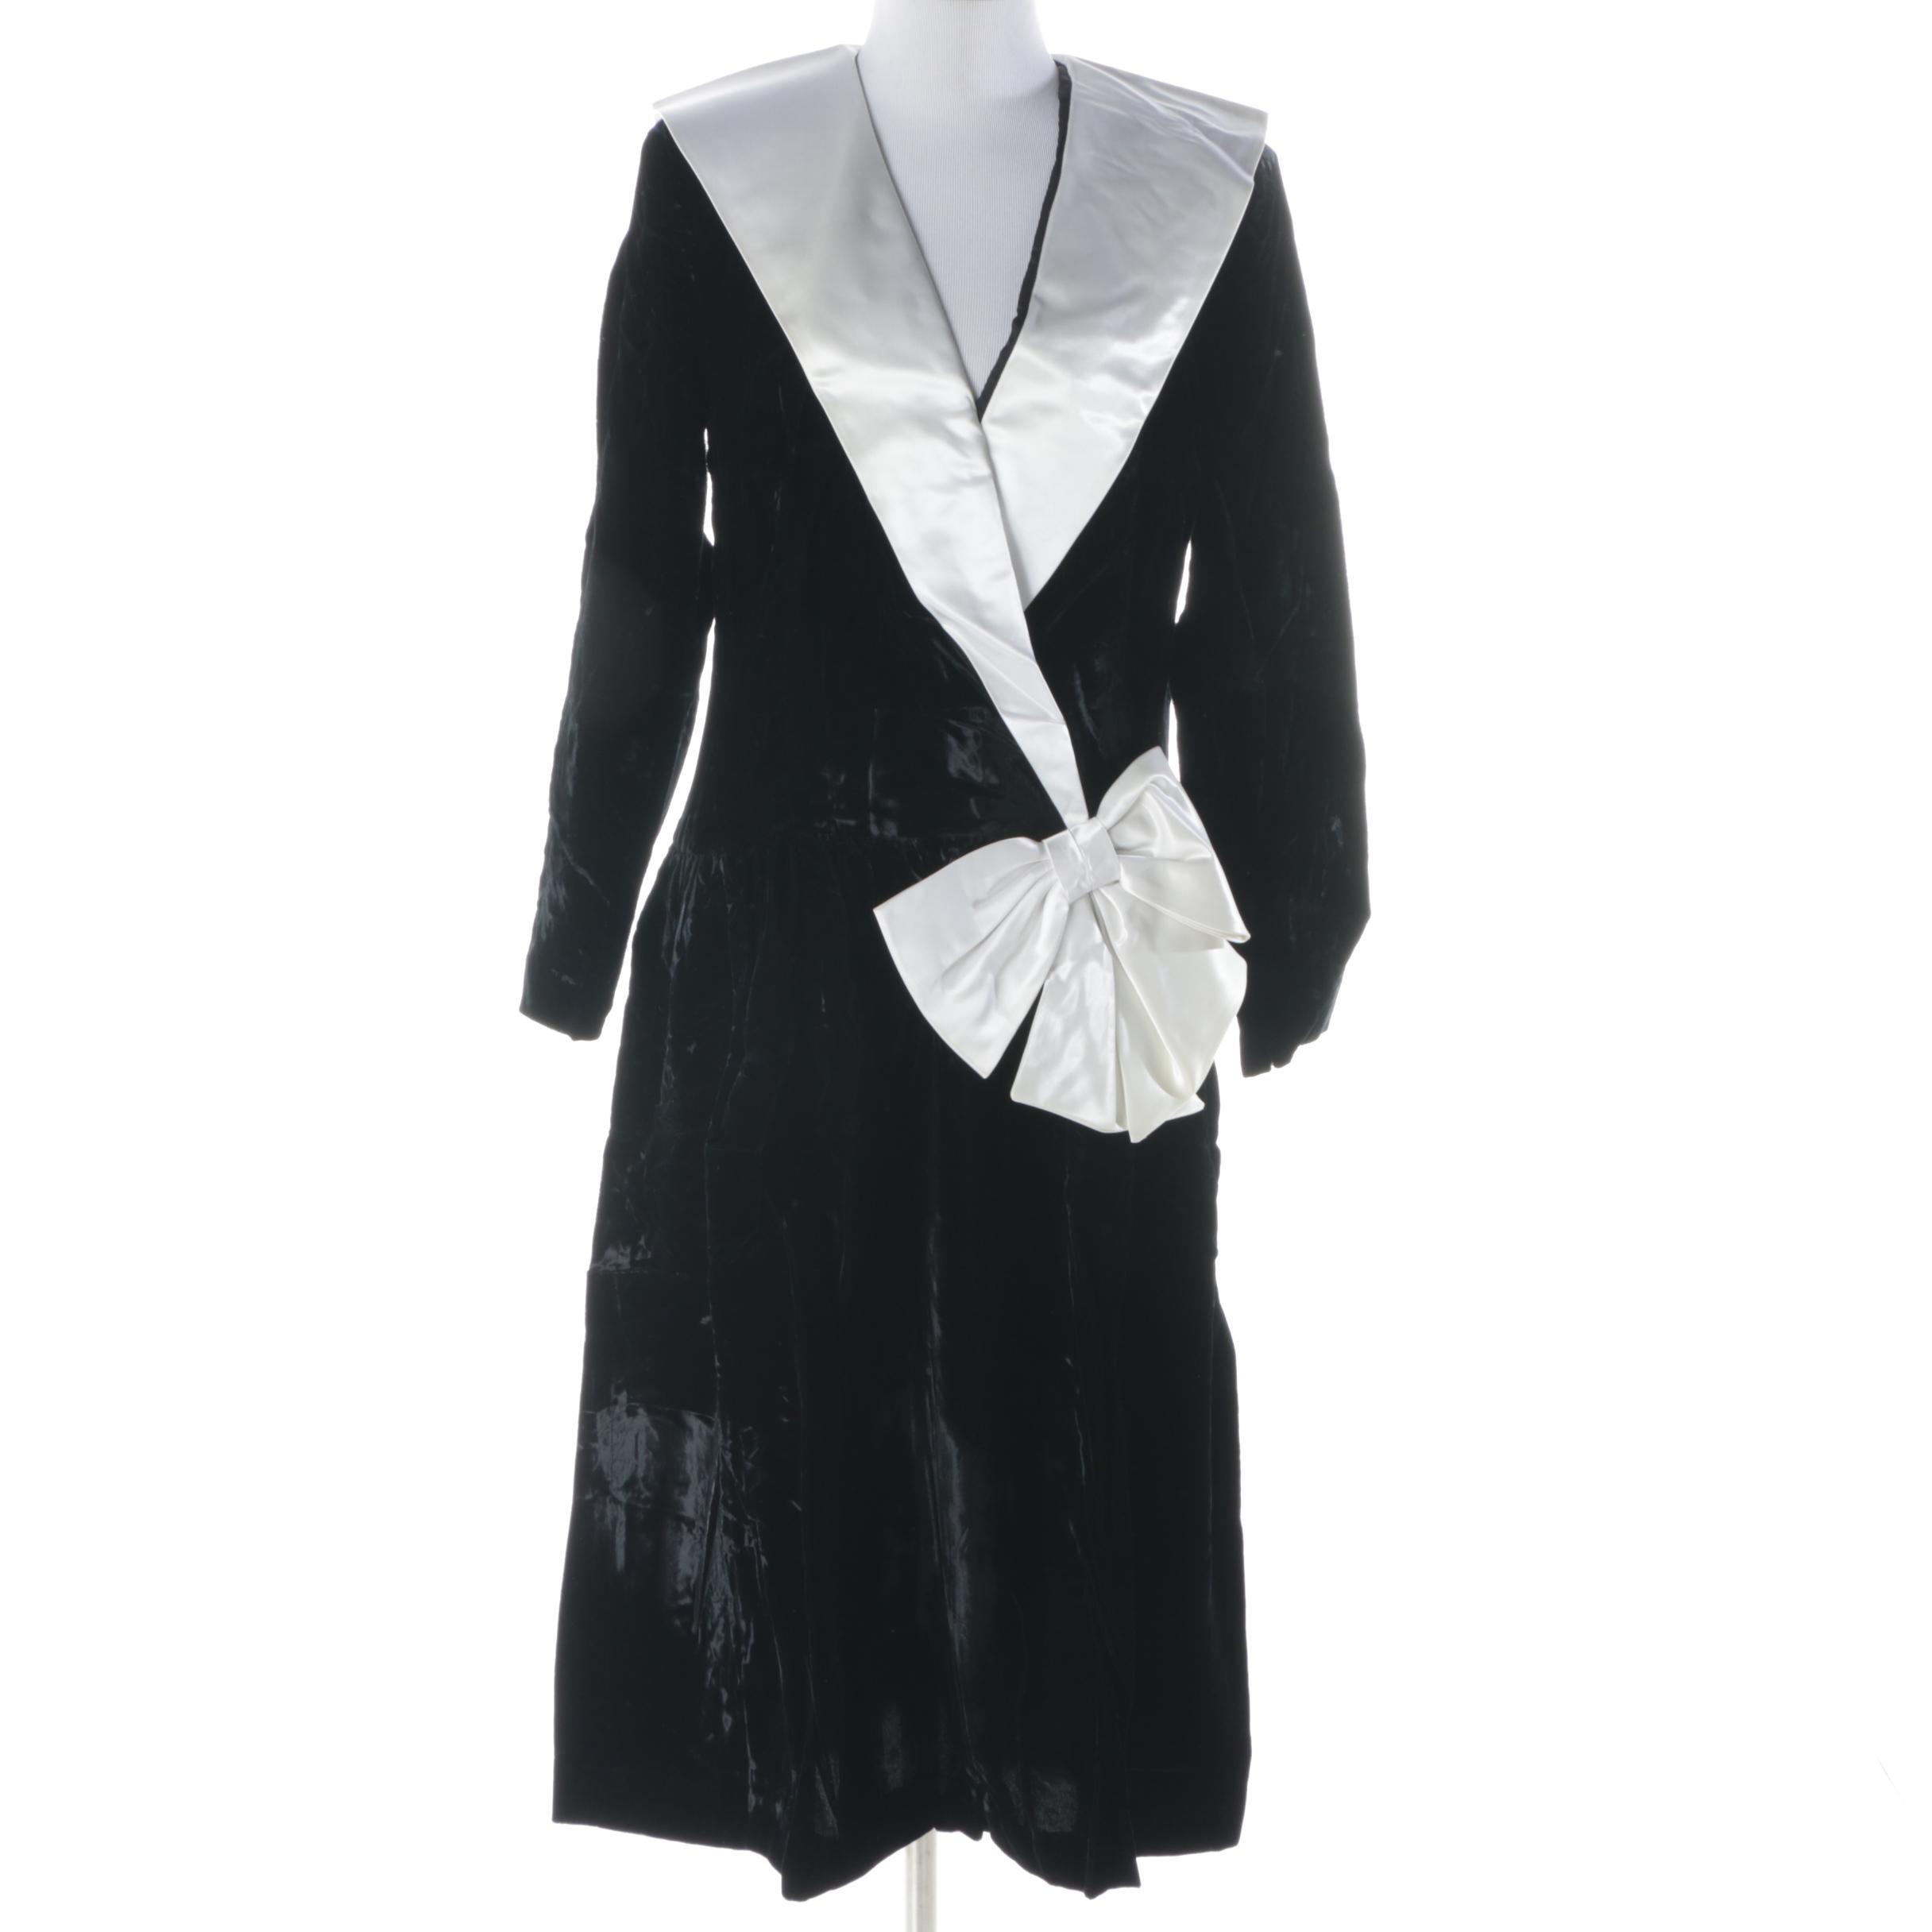 Cattiva by Maya Jornot Velvet Dress